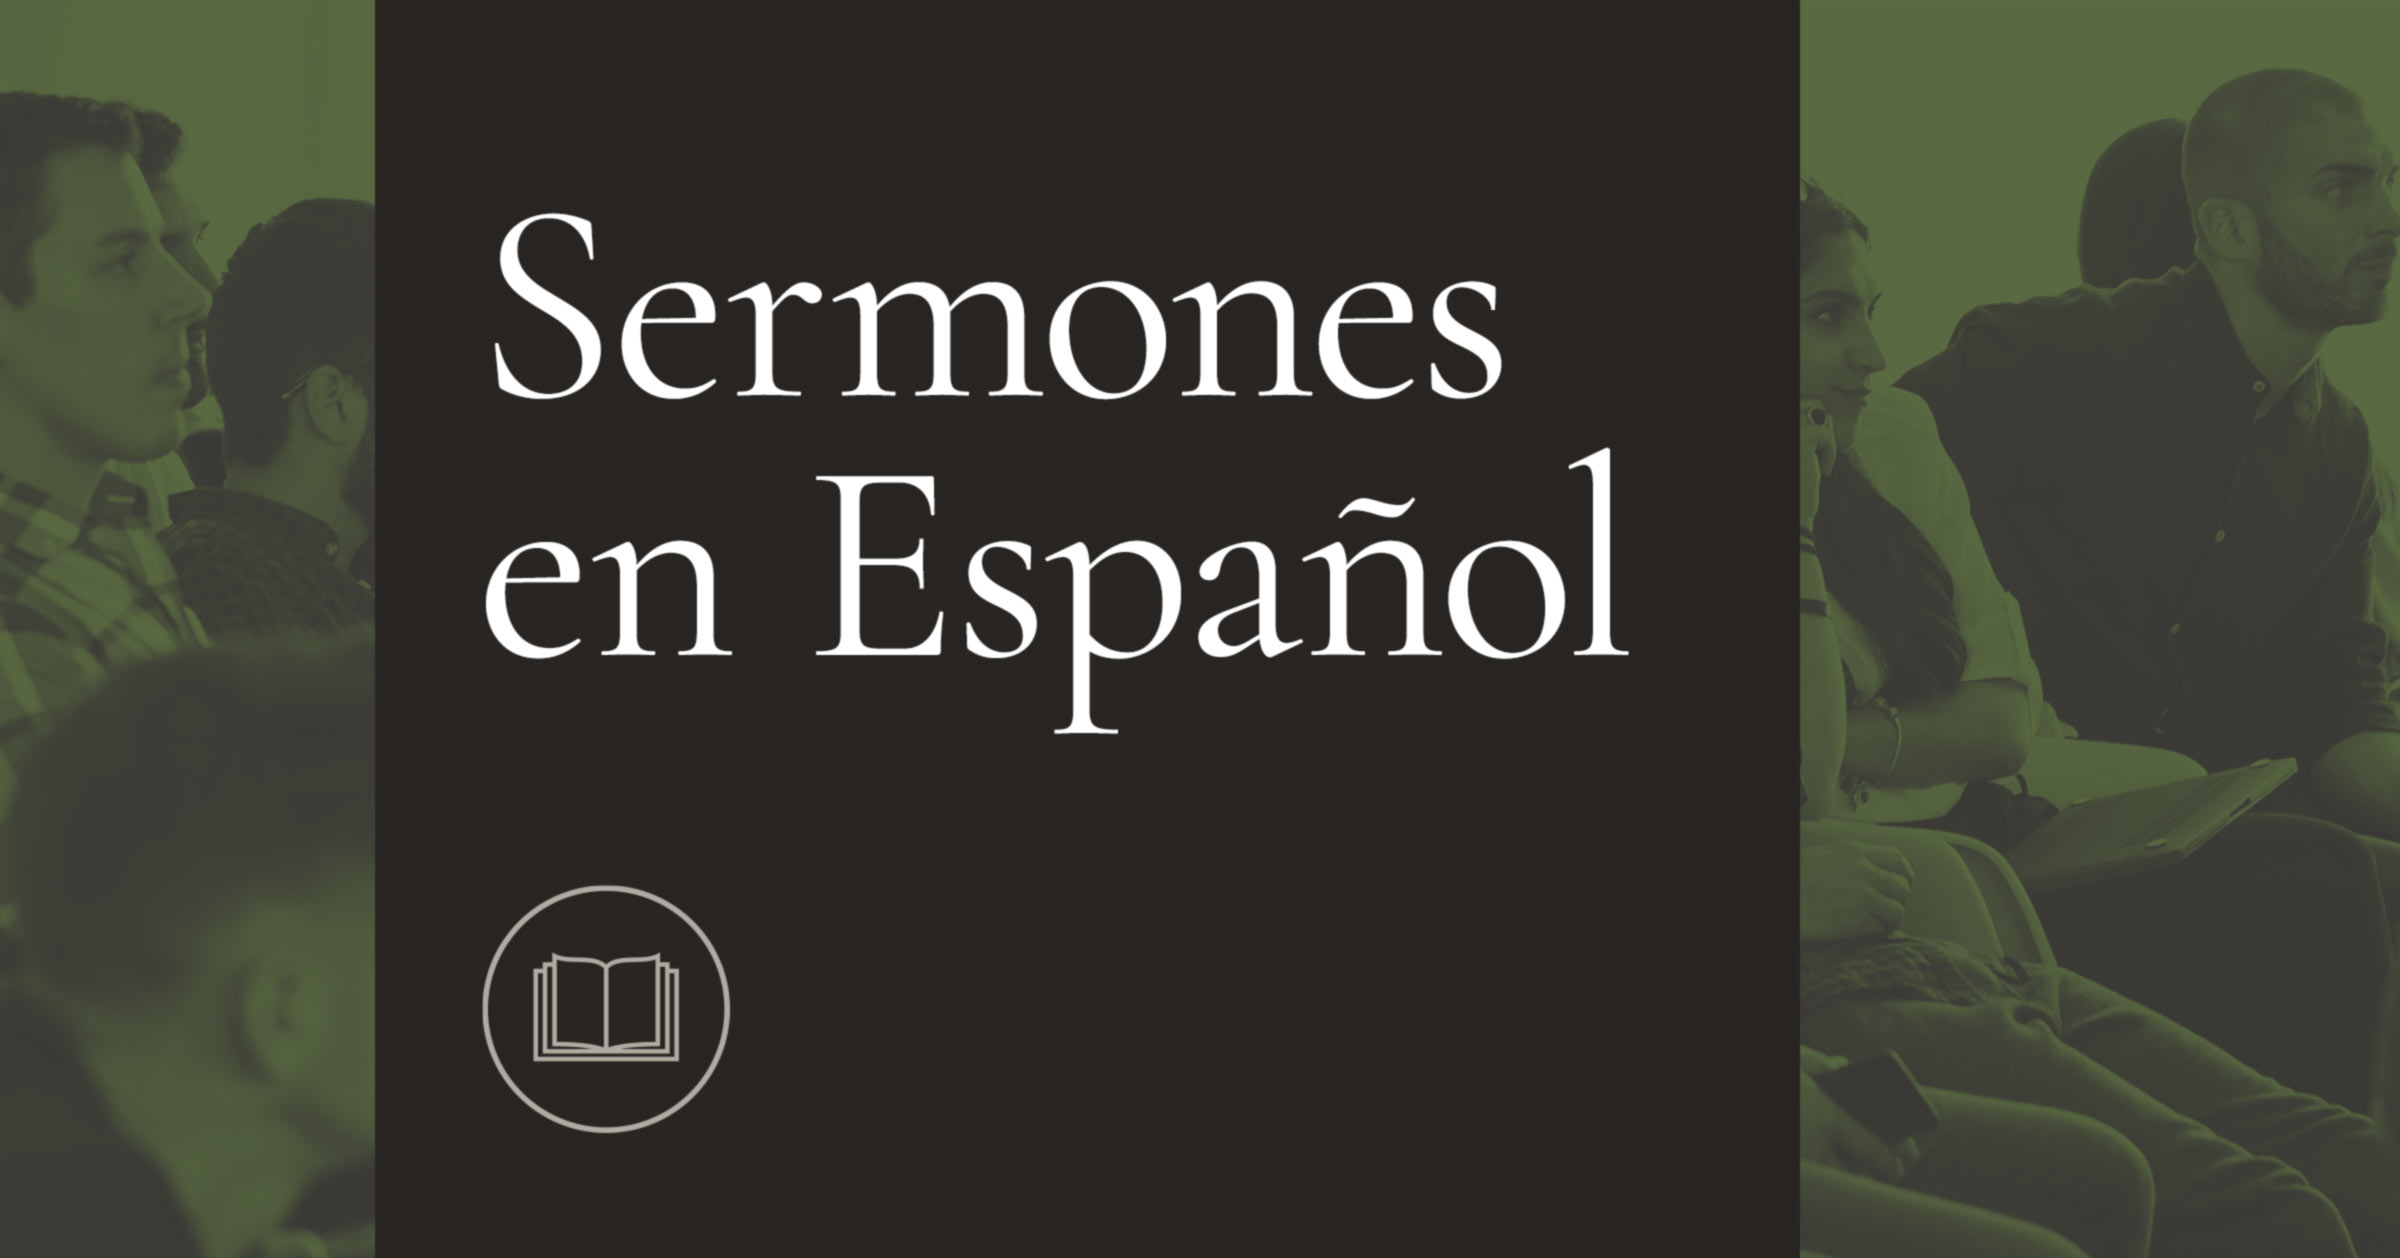 PV Bible Church -- sermones en espanol biblia img